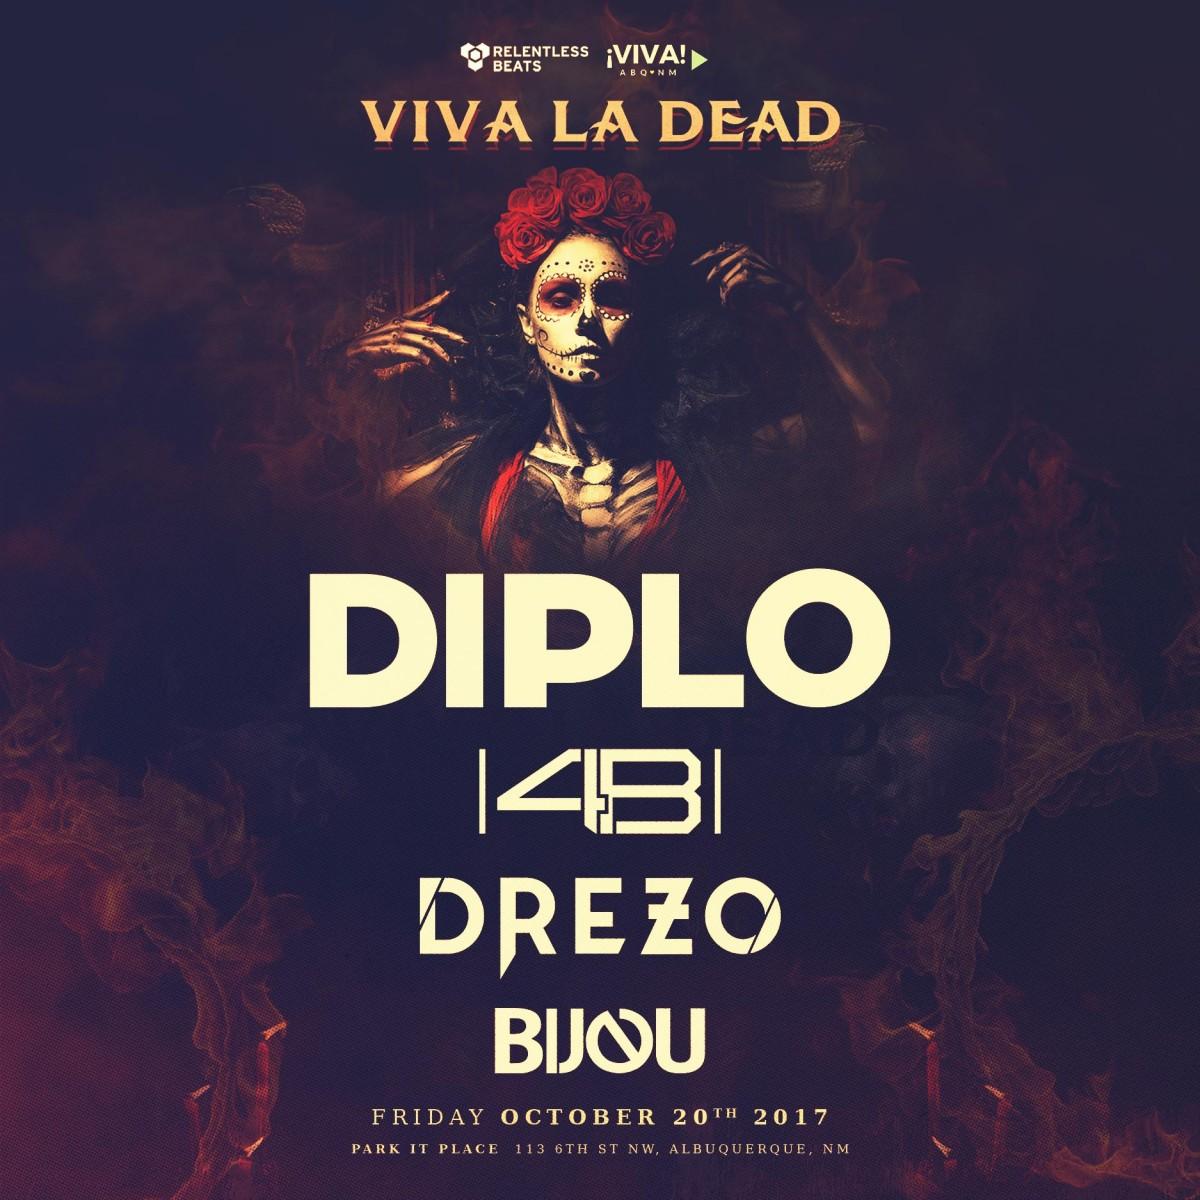 Flyer for Viva La Dead 2017